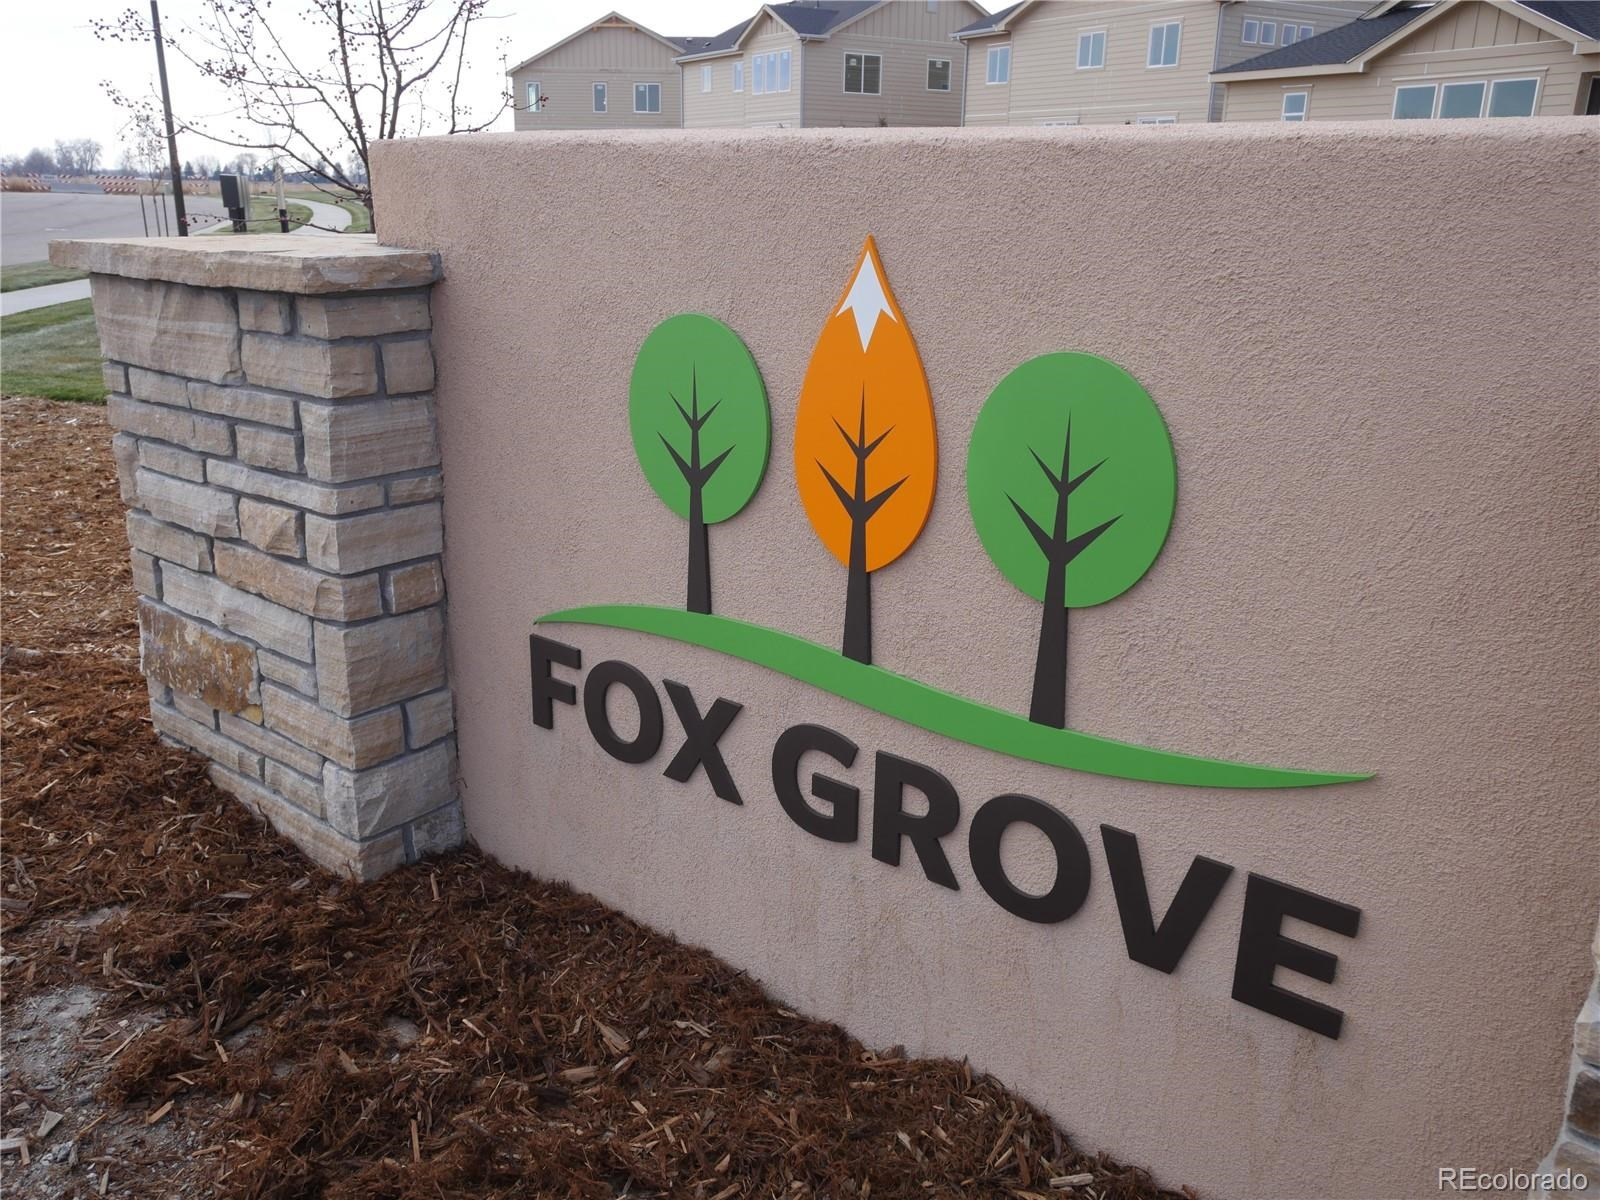 MLS# 9196453 - 25 - 4432 Fox Grove Drive, Fort Collins, CO 80524